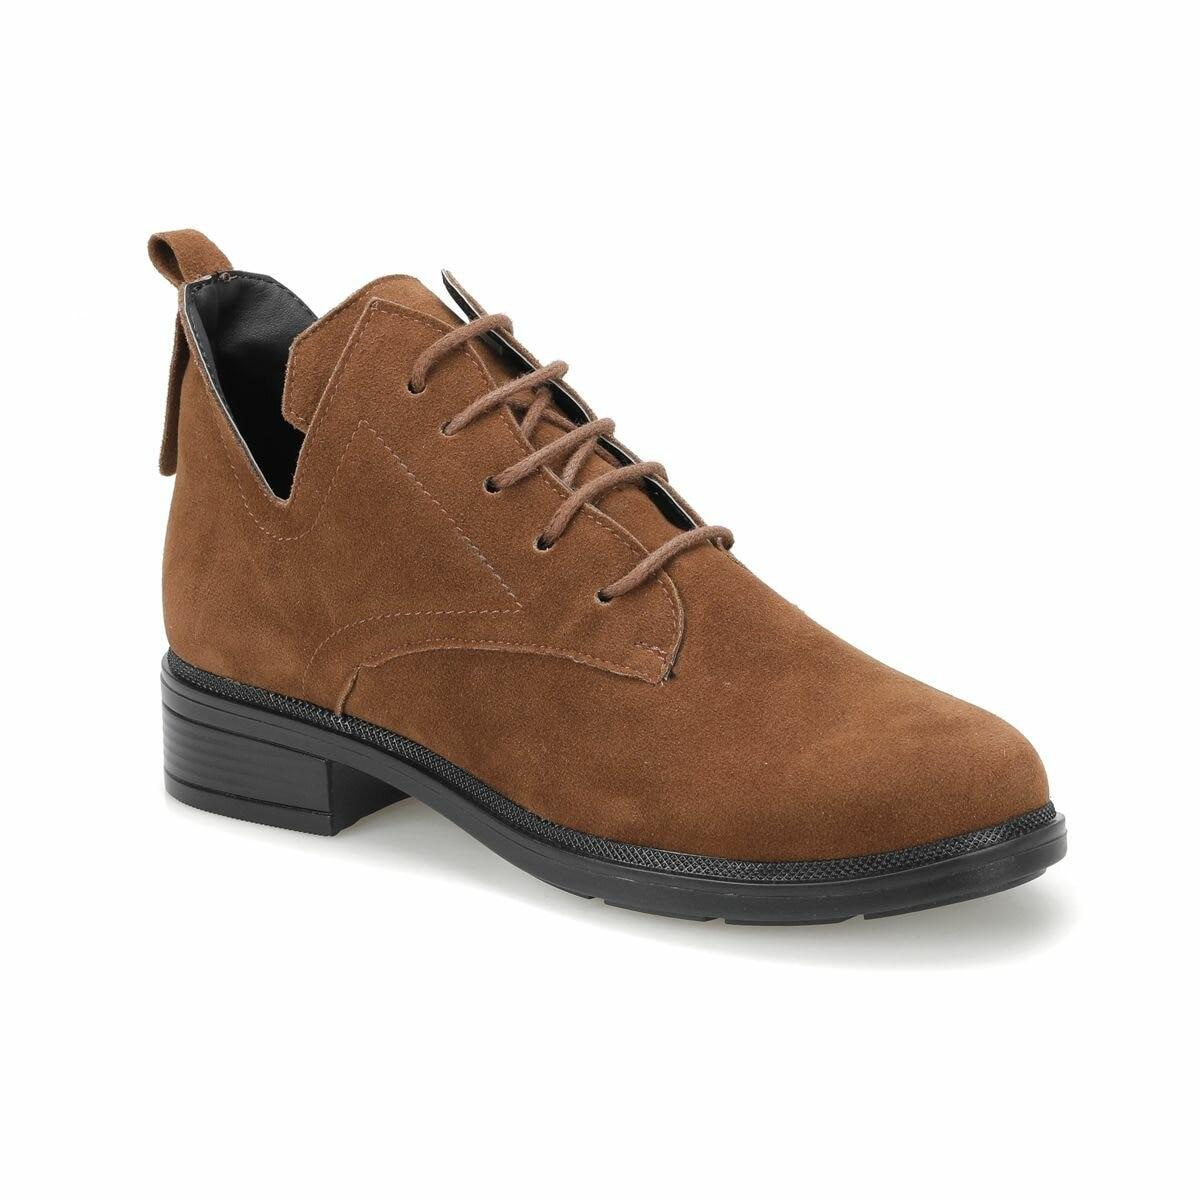 FLO PROP17Z SUEDE Tan Women 'S Boots BUTIGO